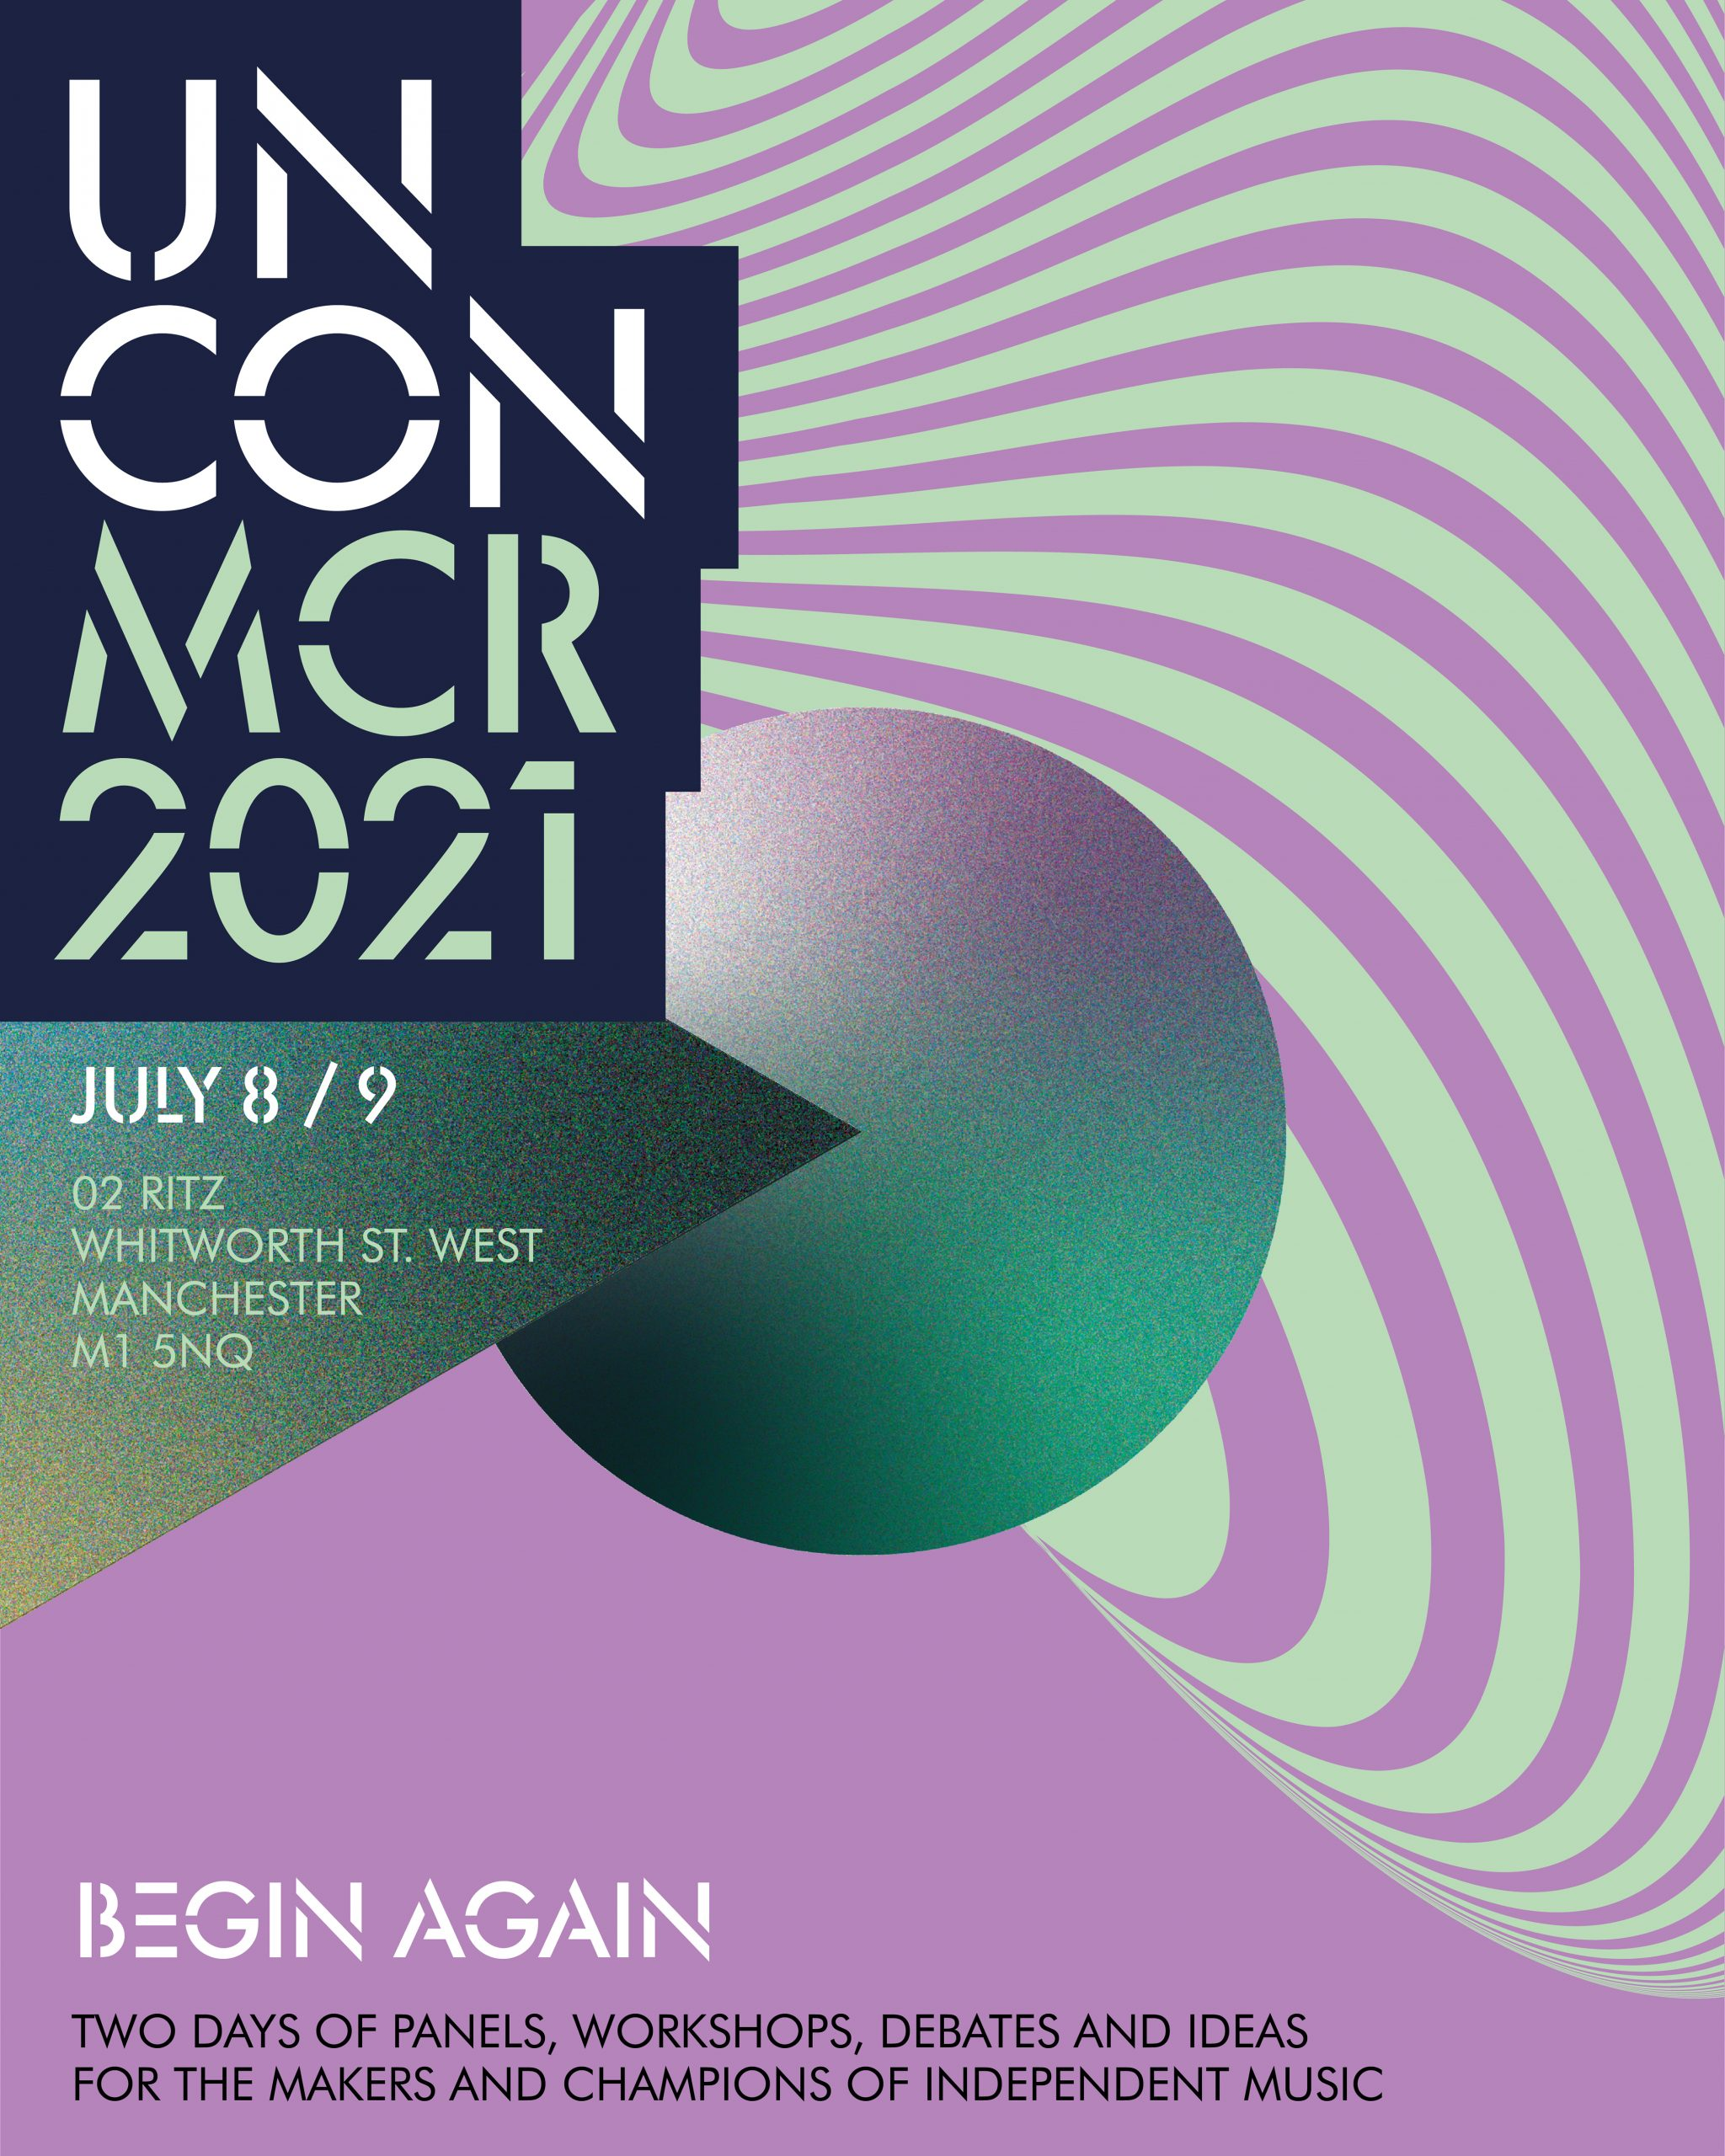 Un-Convention 2021 | O2 Ritz Manchester | Thu 8th July 2021